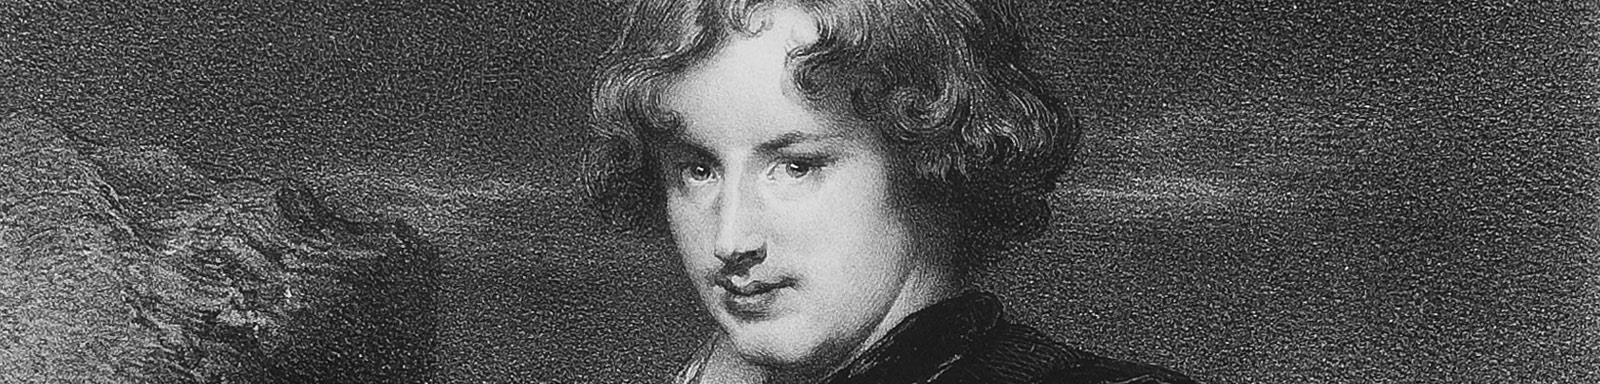 Dyck, Anton van